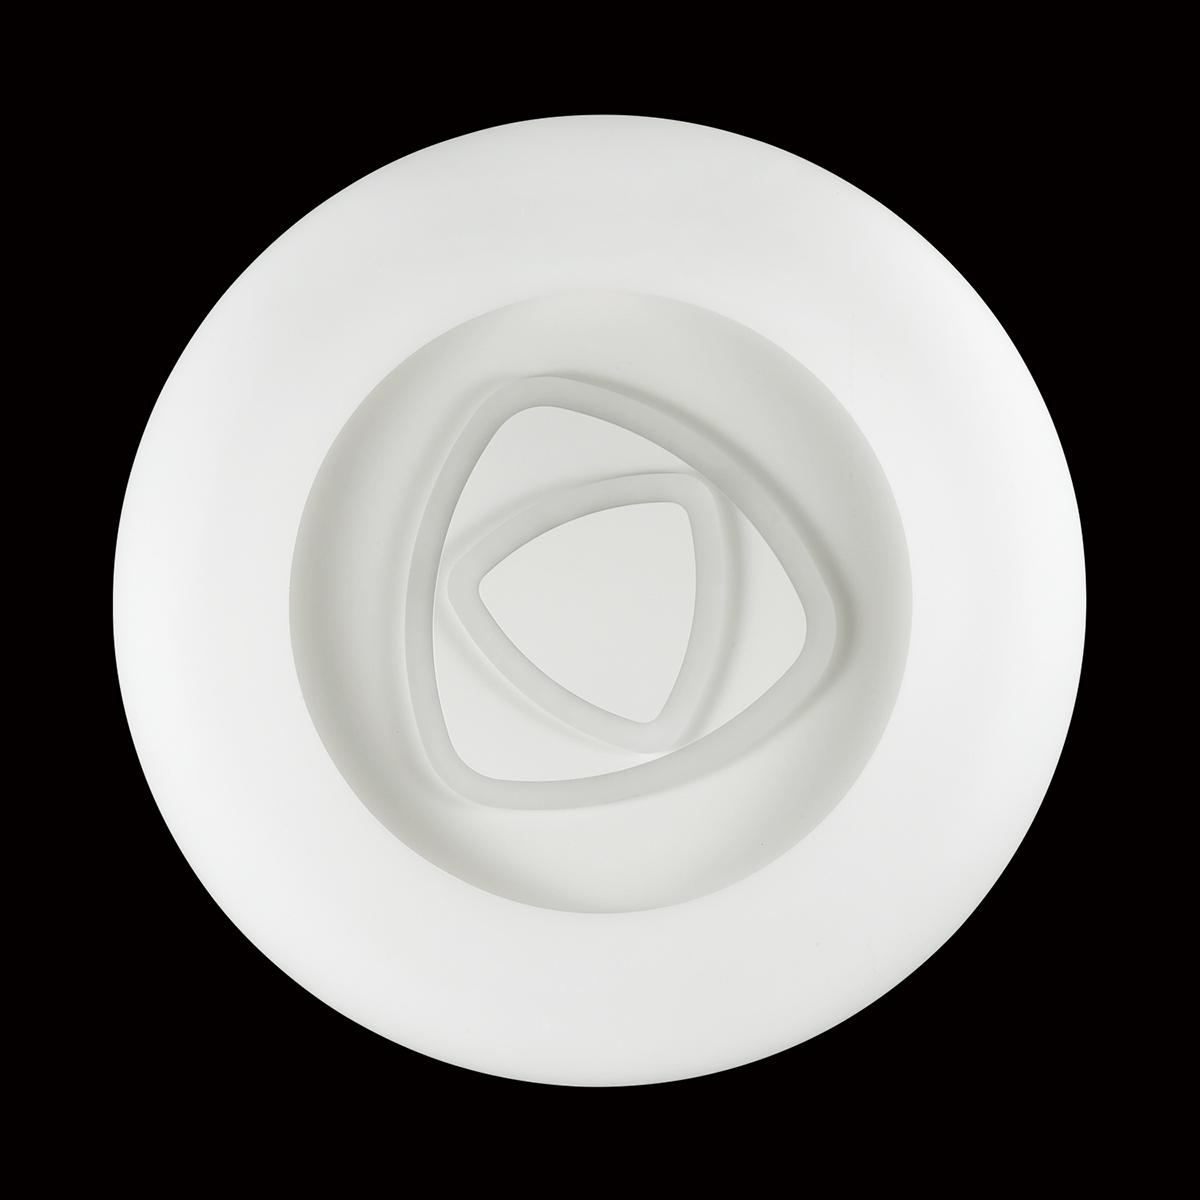 Потолочная люстра Lumion Otto 4419/99CL, белый, металл, пластик - фото 7